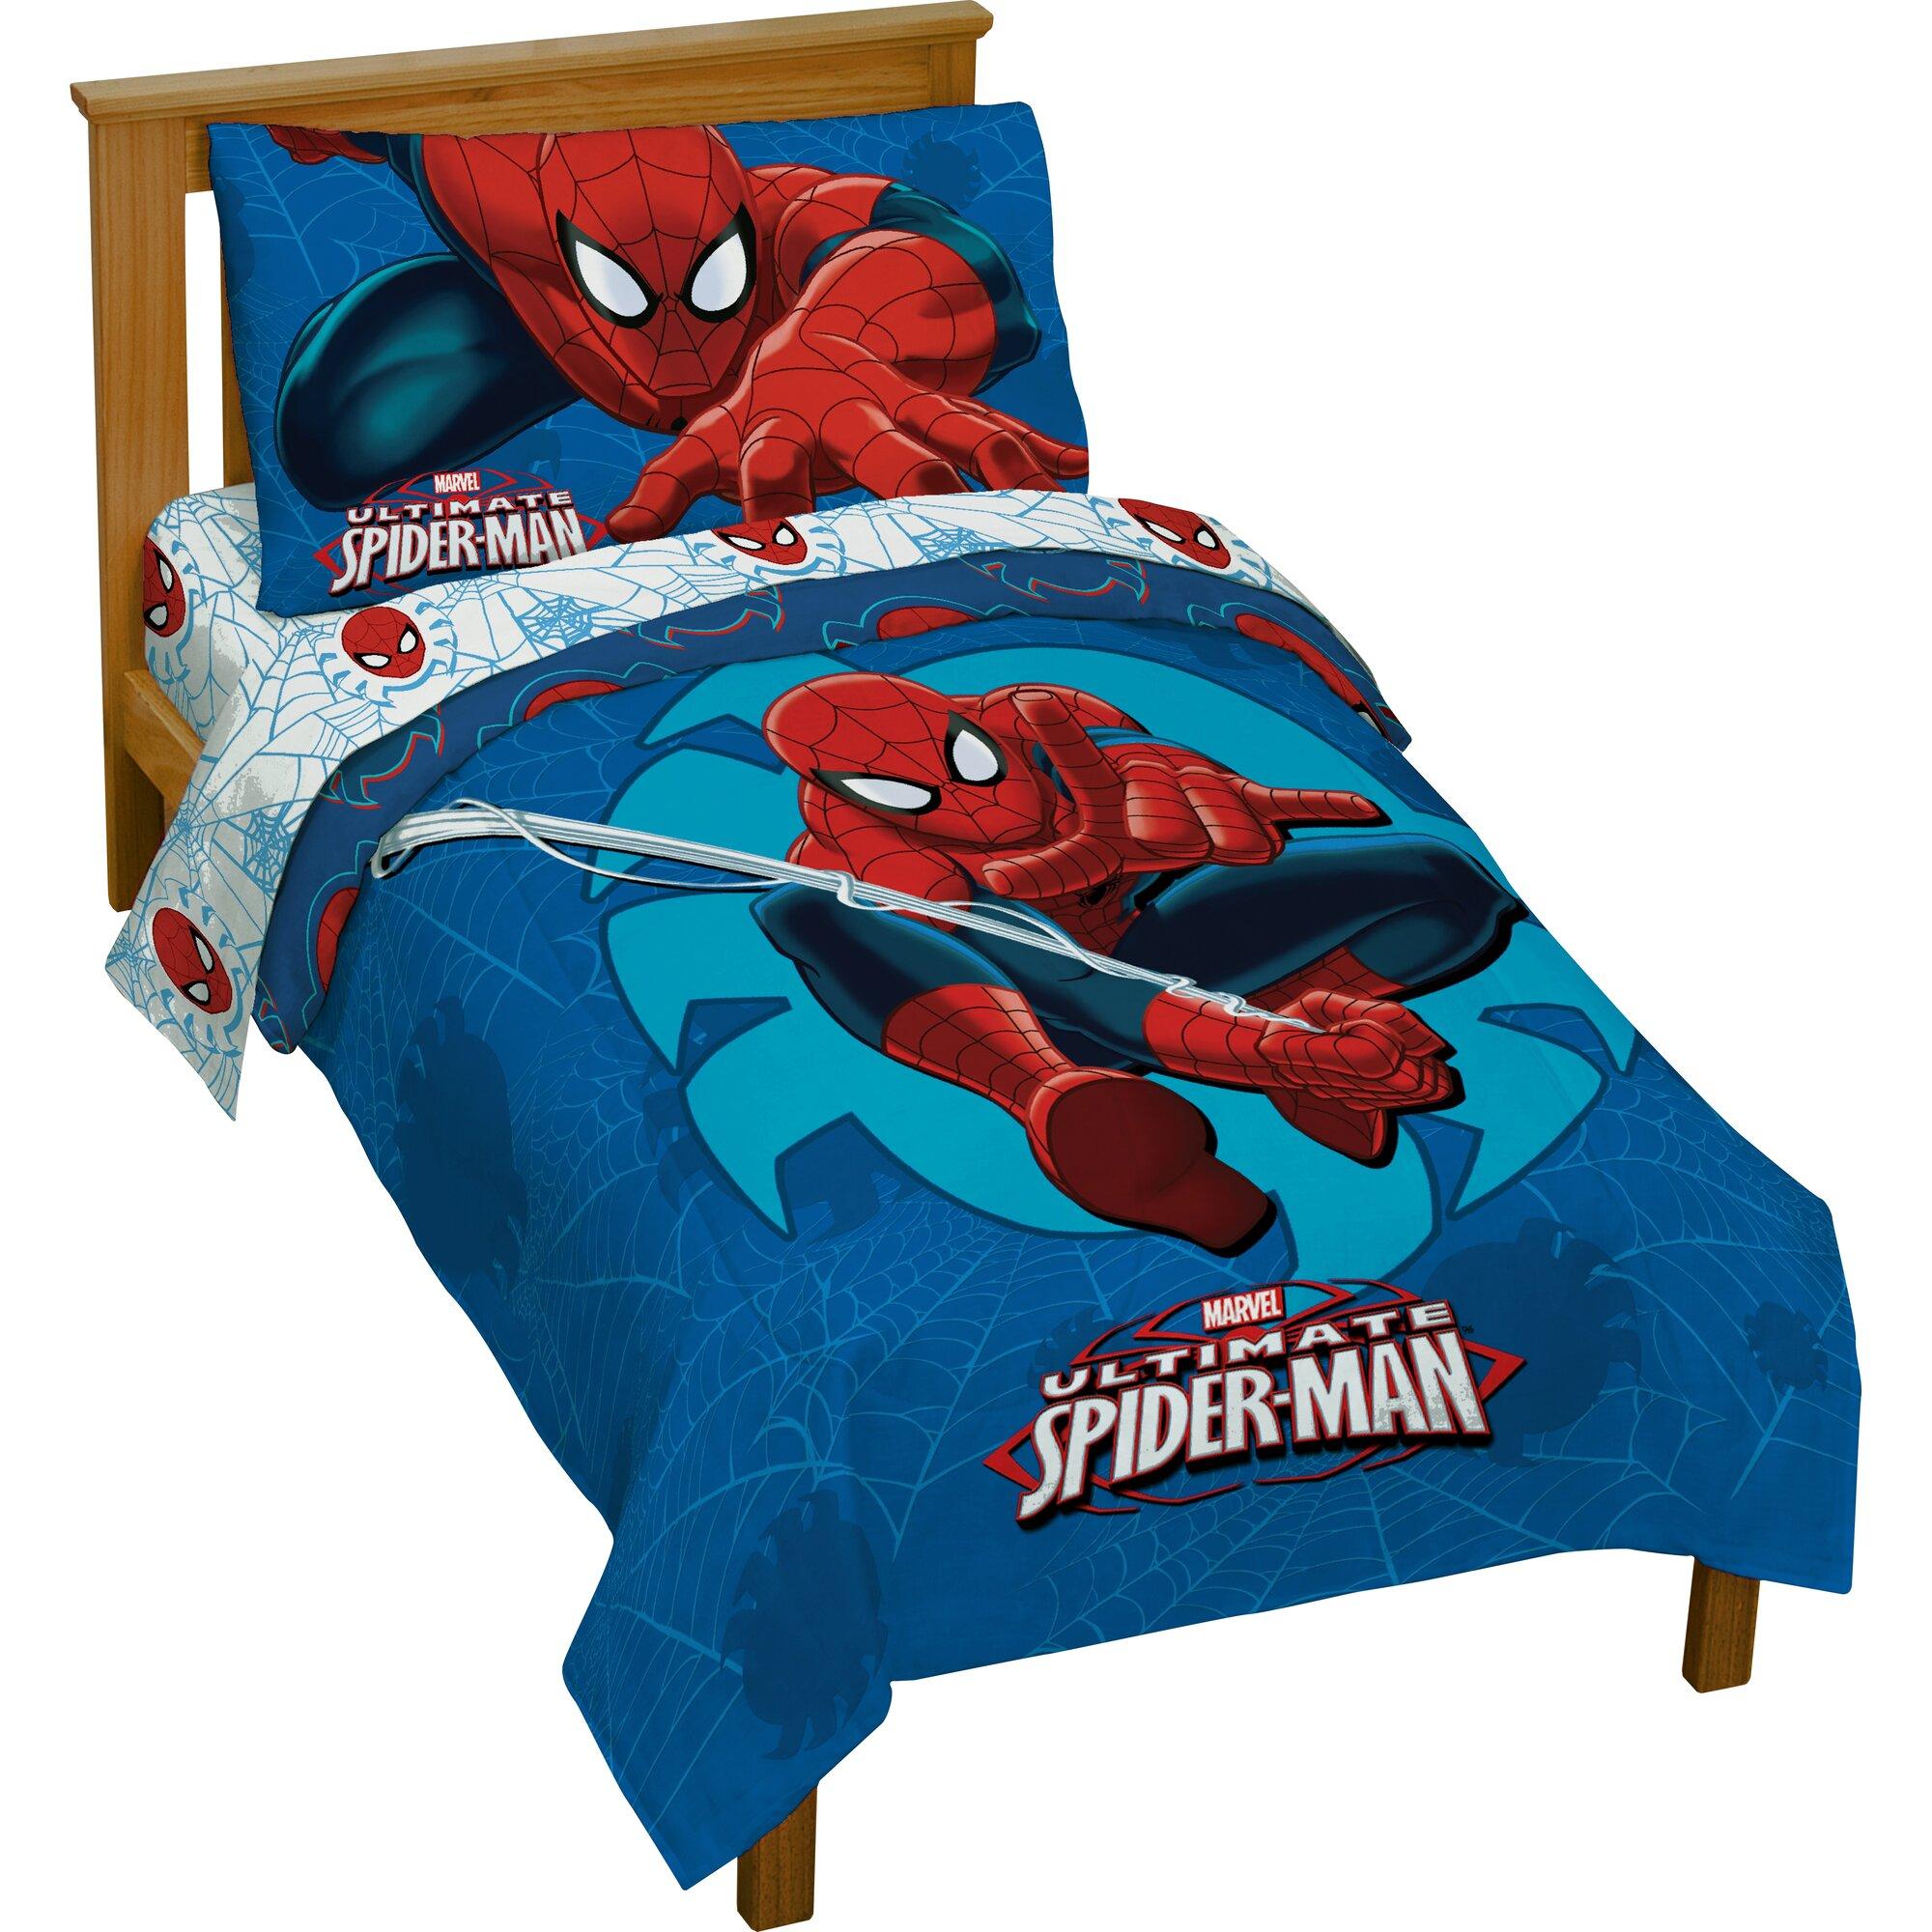 Marvel Spiderman Toddler Bedding Set & Reviews | Wayfair